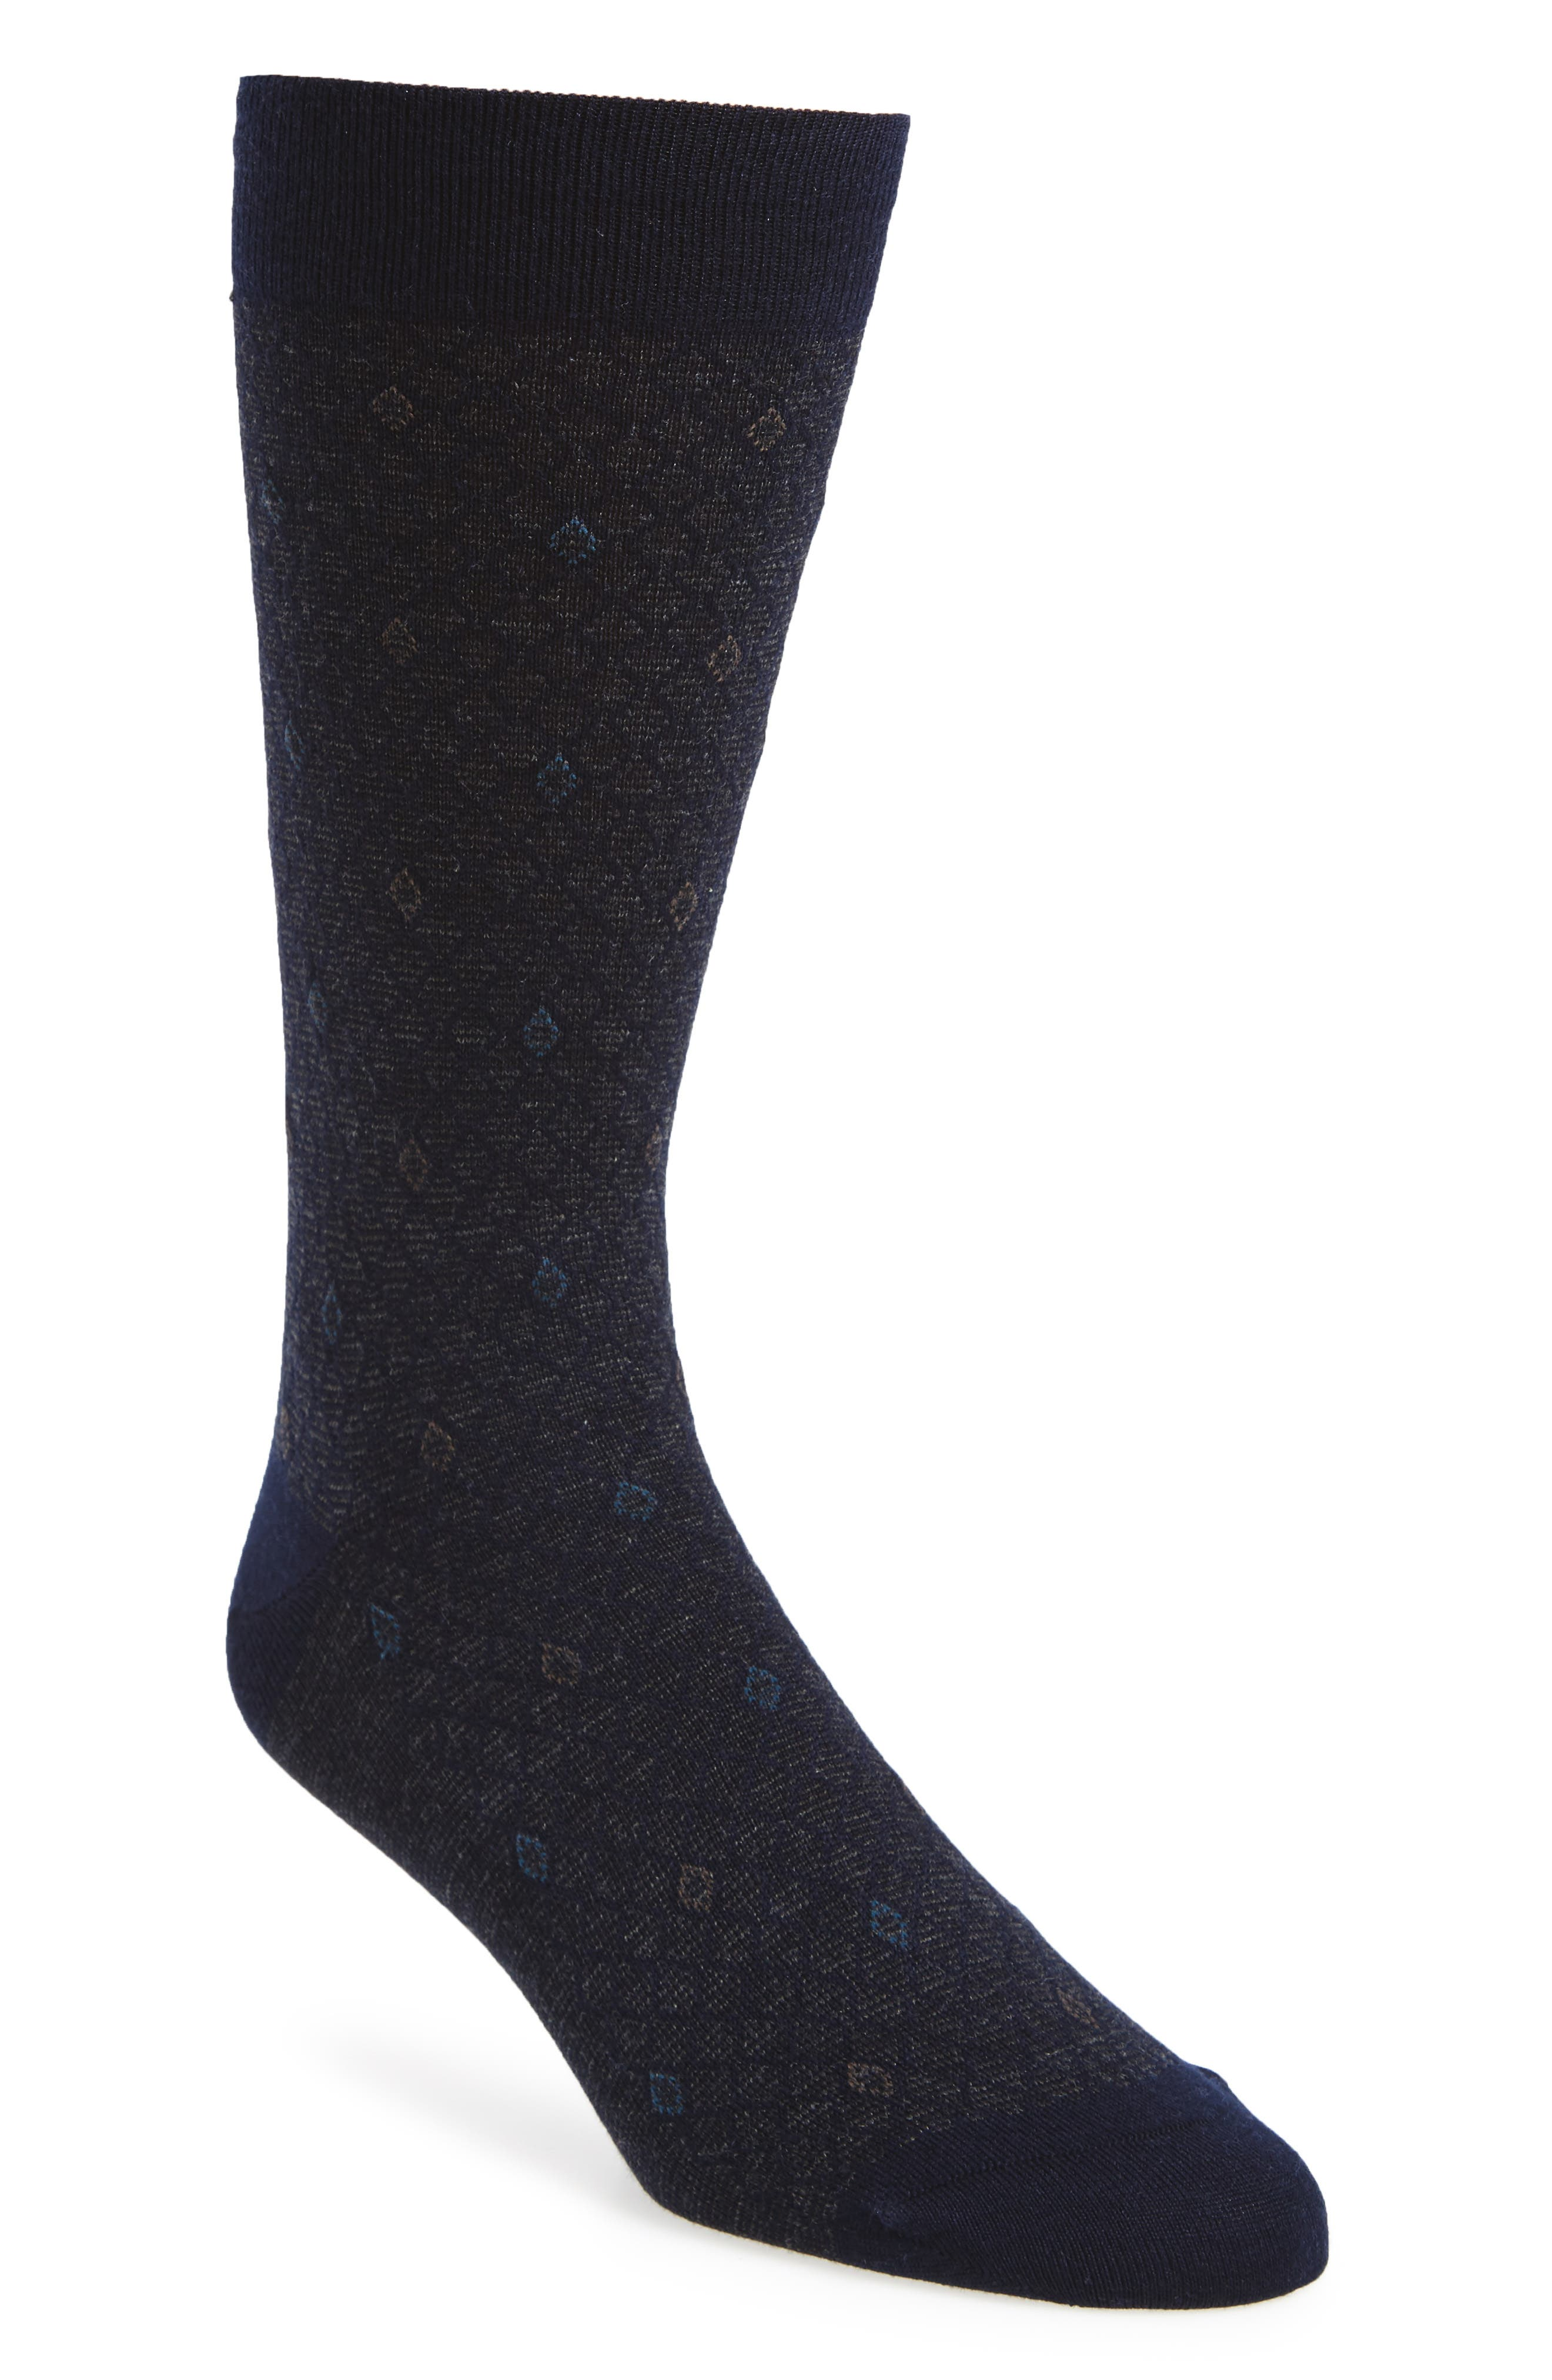 Diamond Wool Blend Socks,                         Main,                         color,